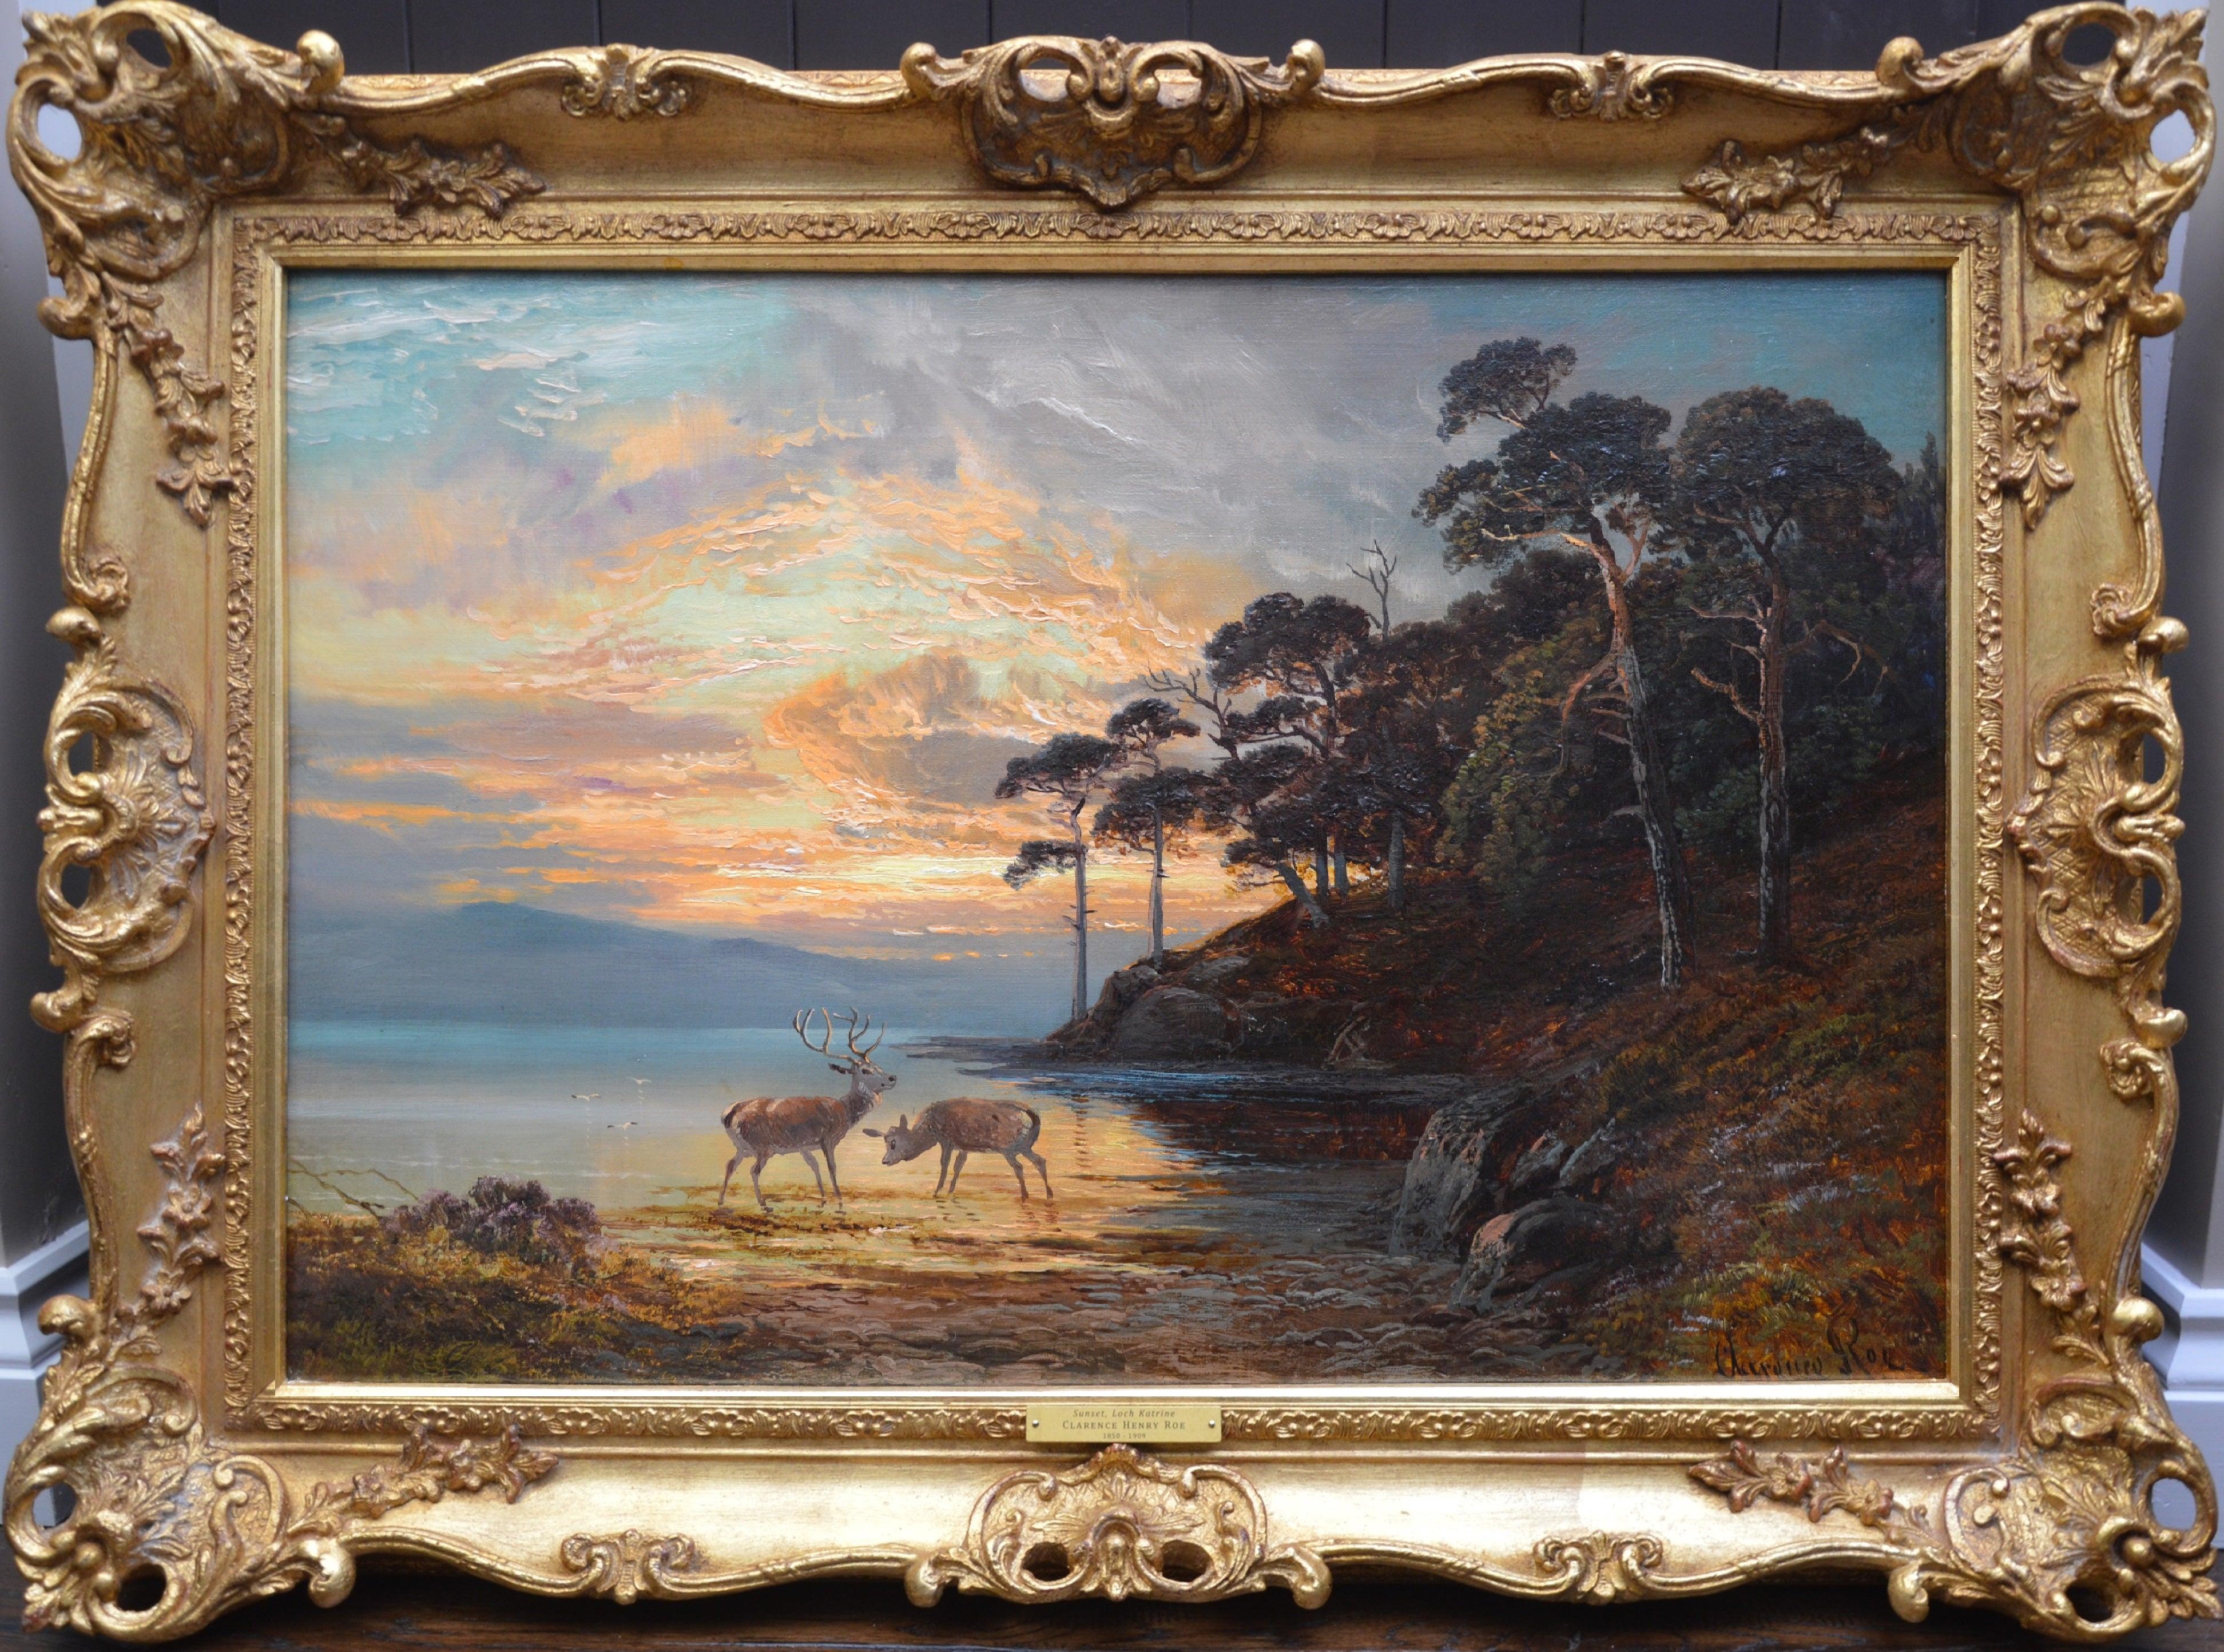 Sunset, Loch Katrine - 19th Century Scottish Landscape Oil Painting